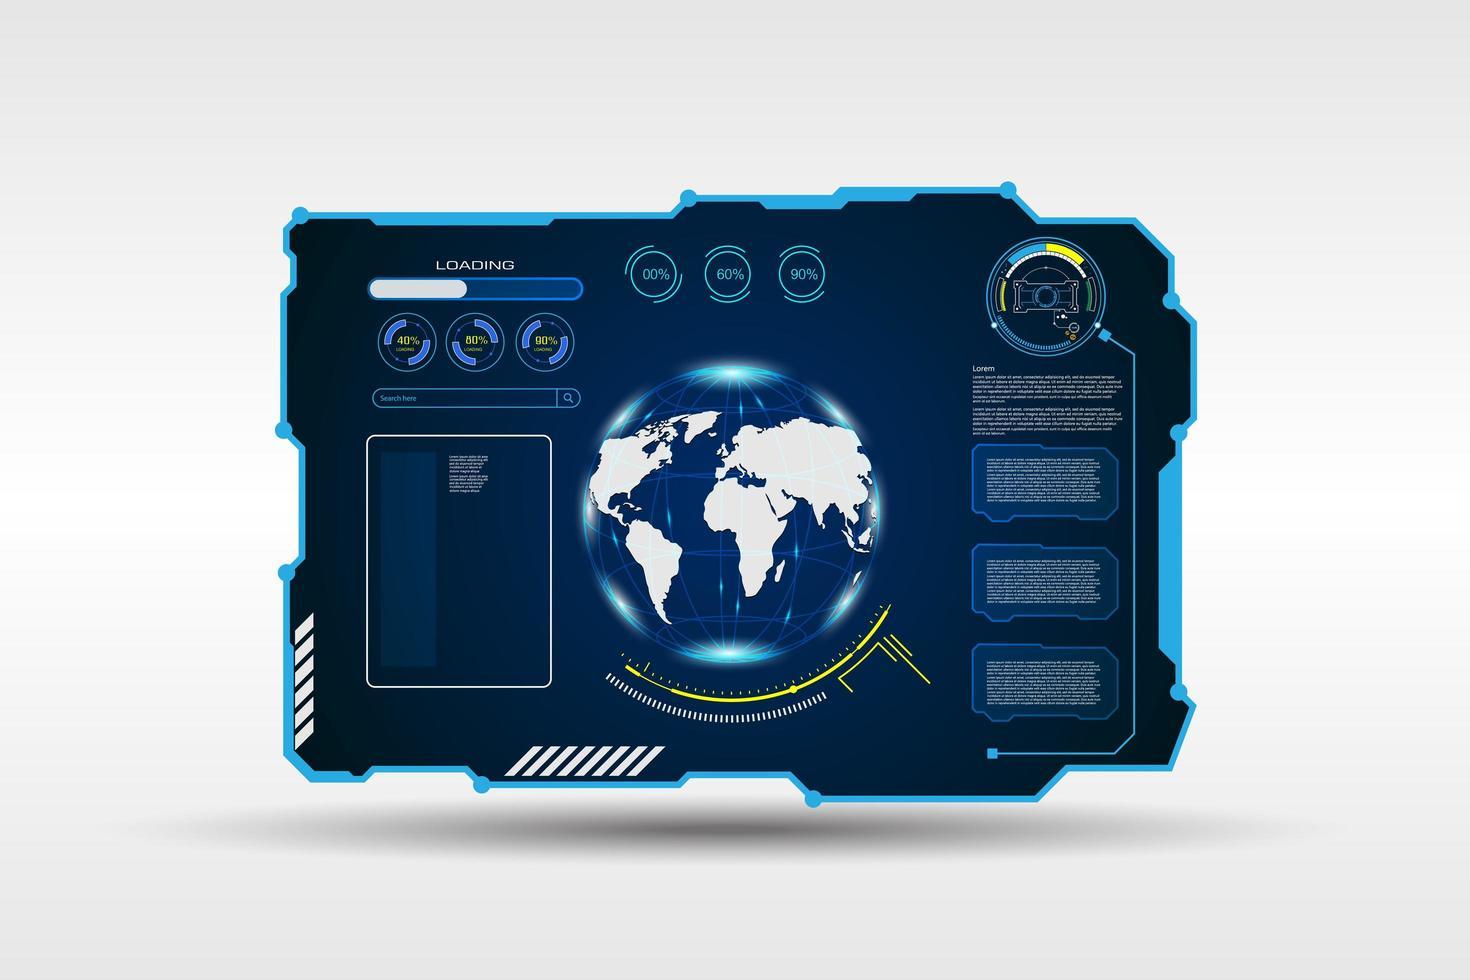 Weltkarte digitaler Rahmen gesetzt vektor